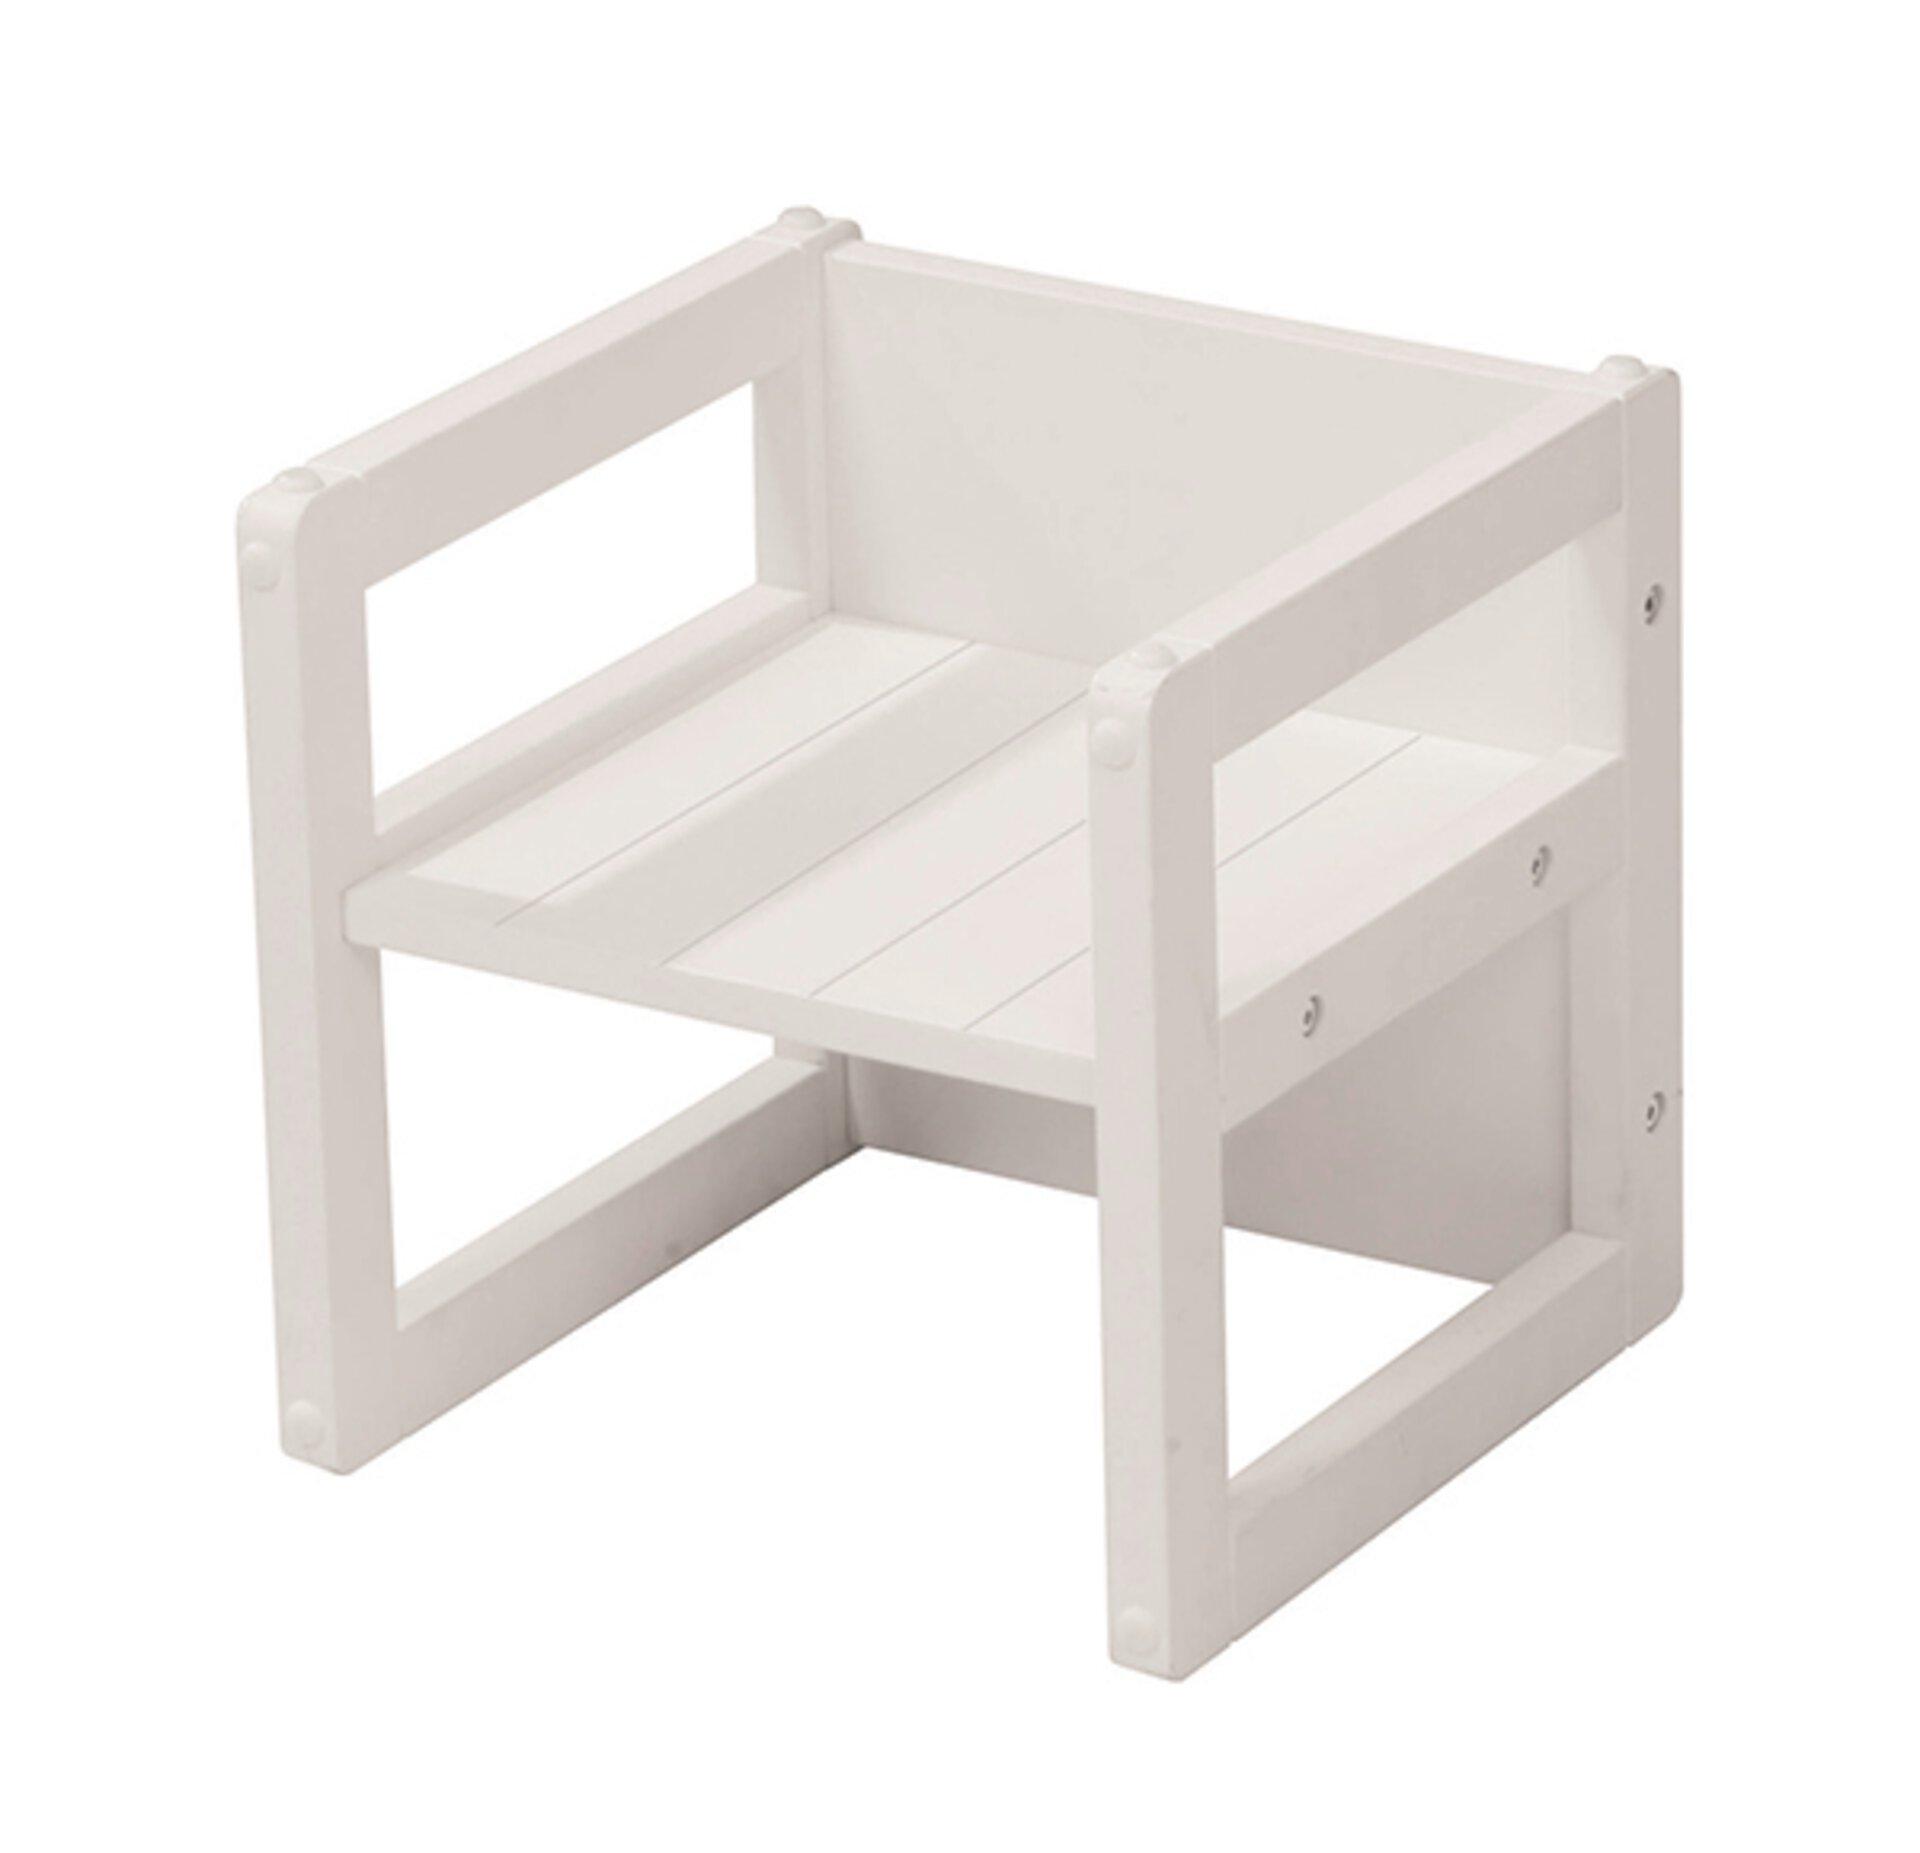 Sitzhocker Roba Baumann Holzwerkstoff 30 x 30 x 30 cm